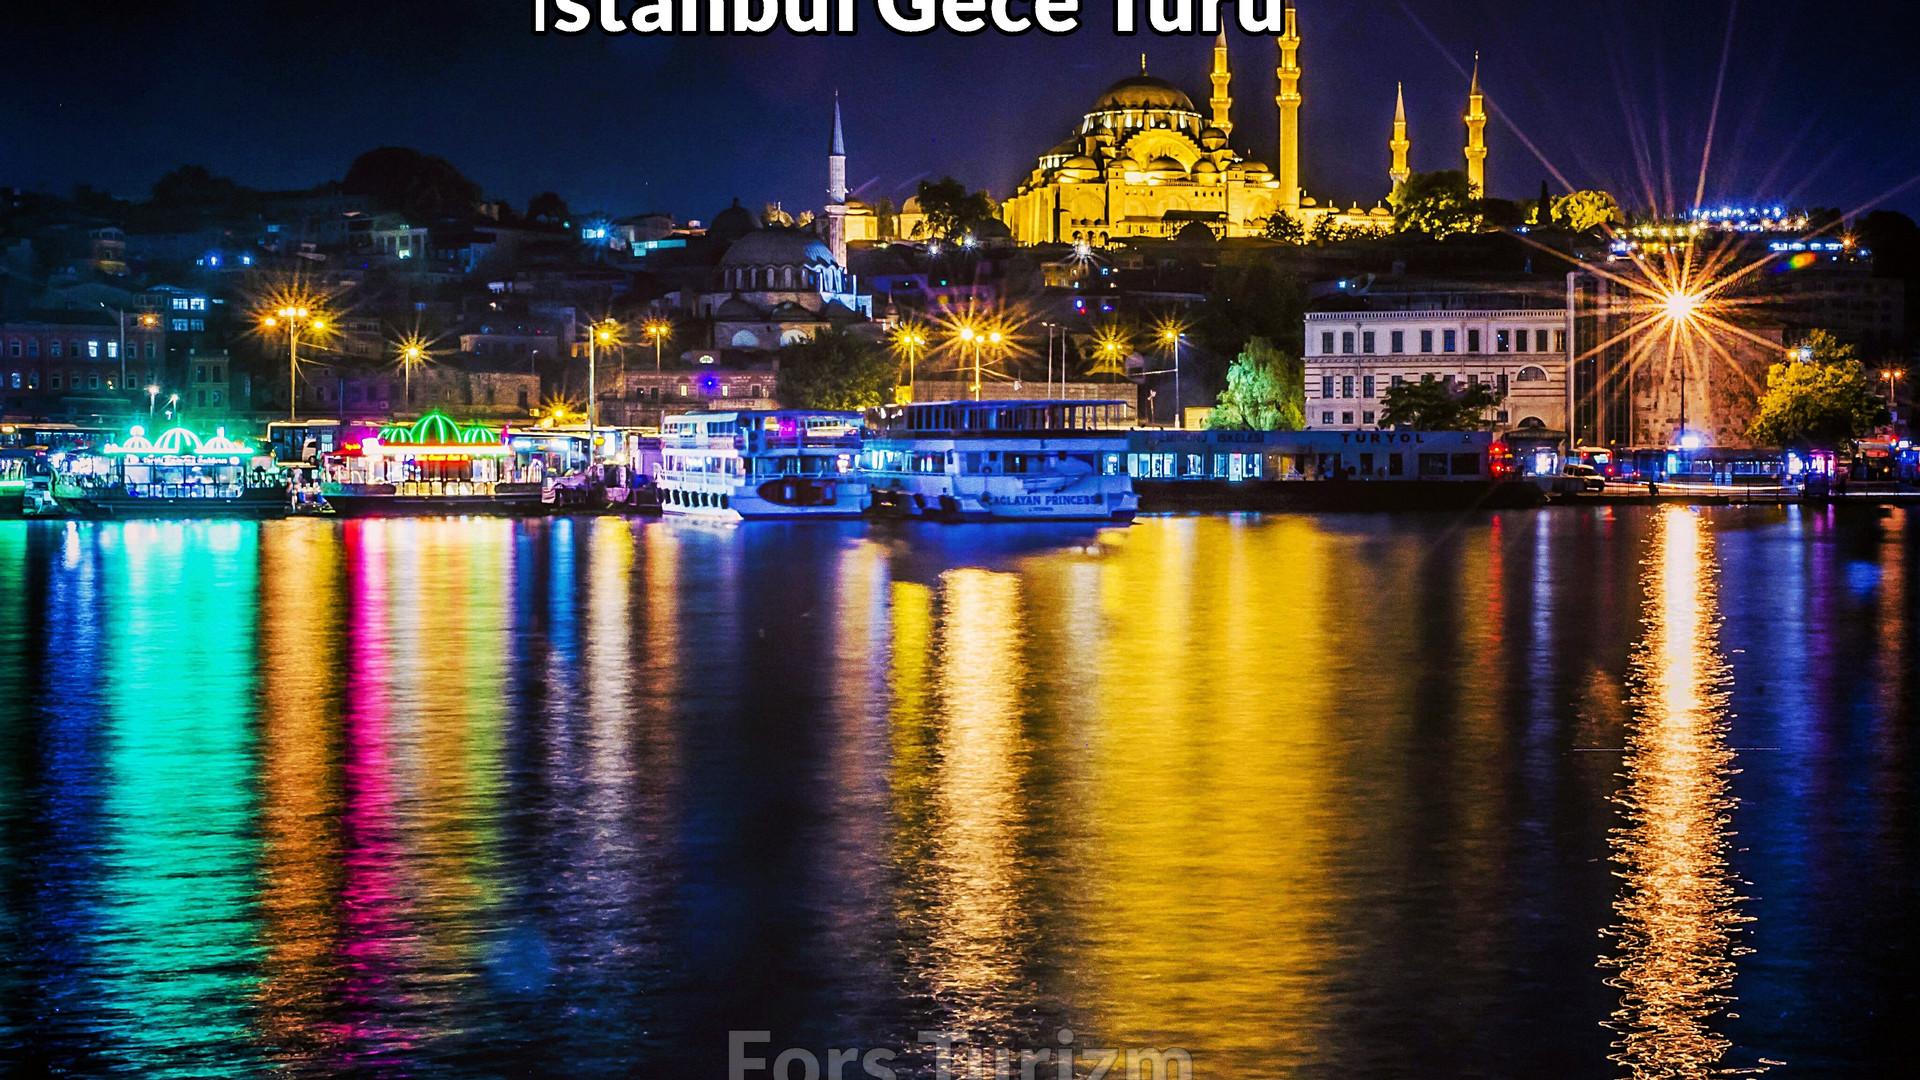 istanbul Gece Turu